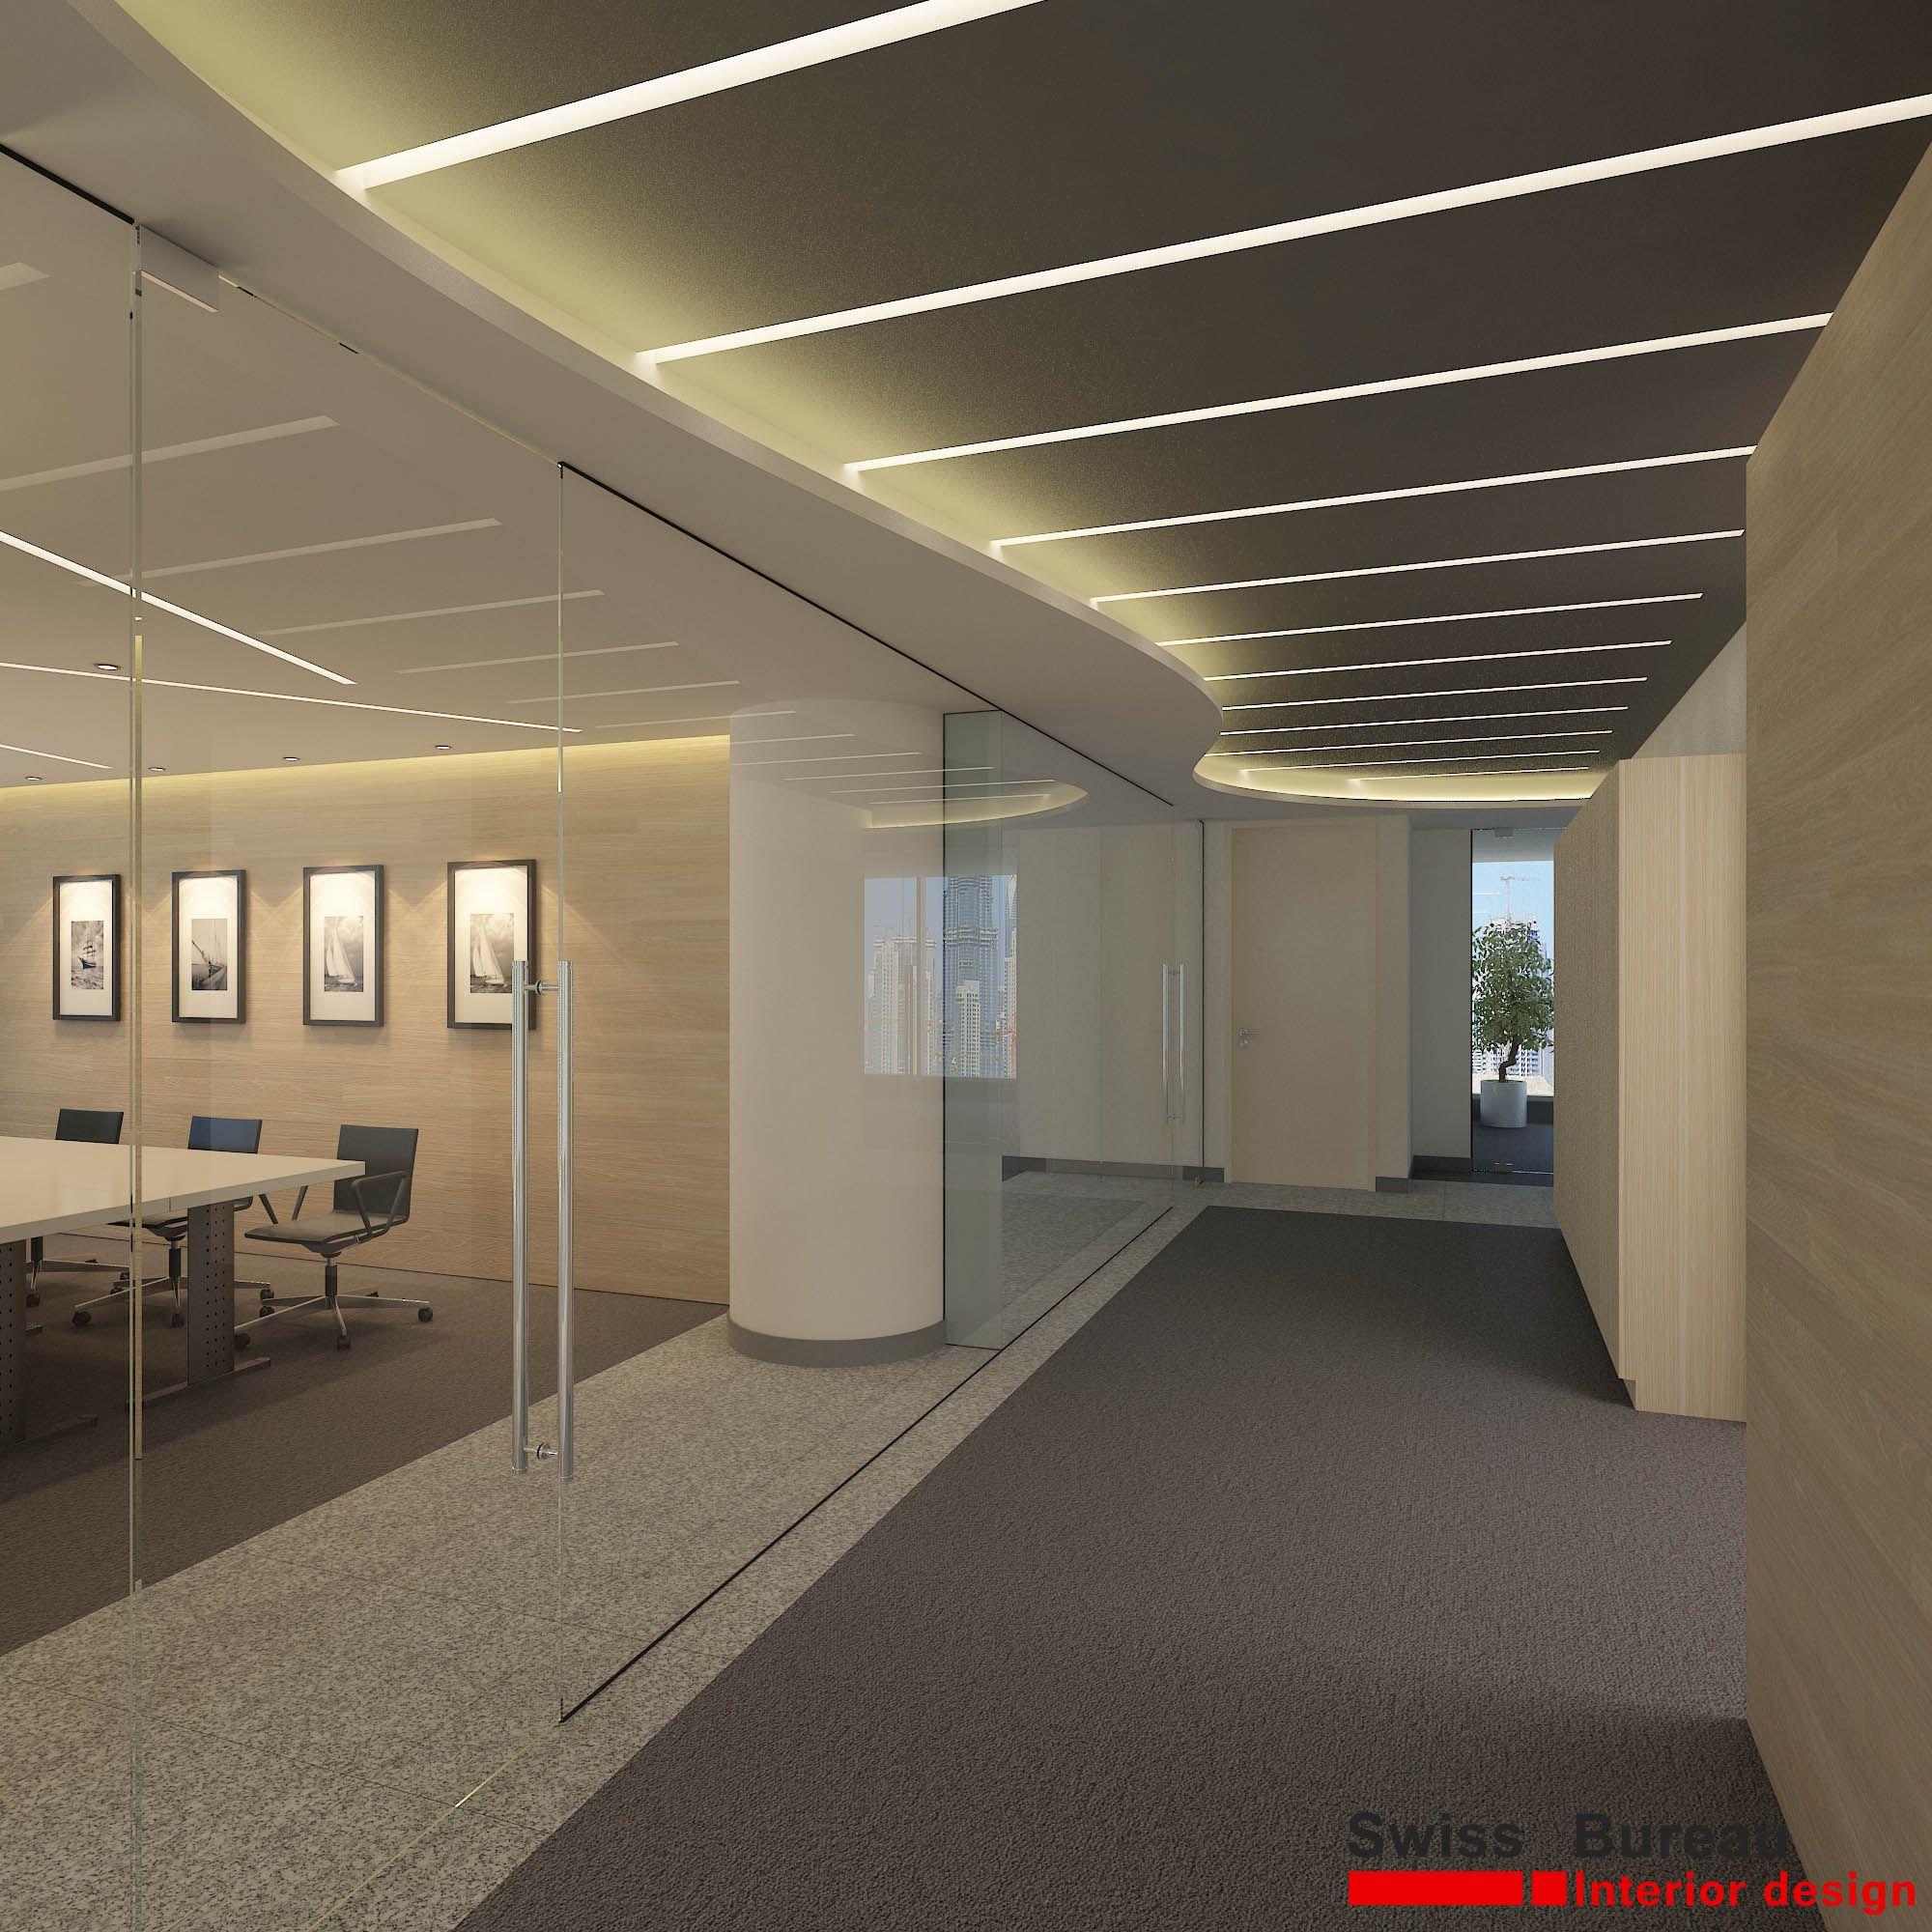 Corporate office corridor design by swiss bureau for Iluminacion oficinas modernas